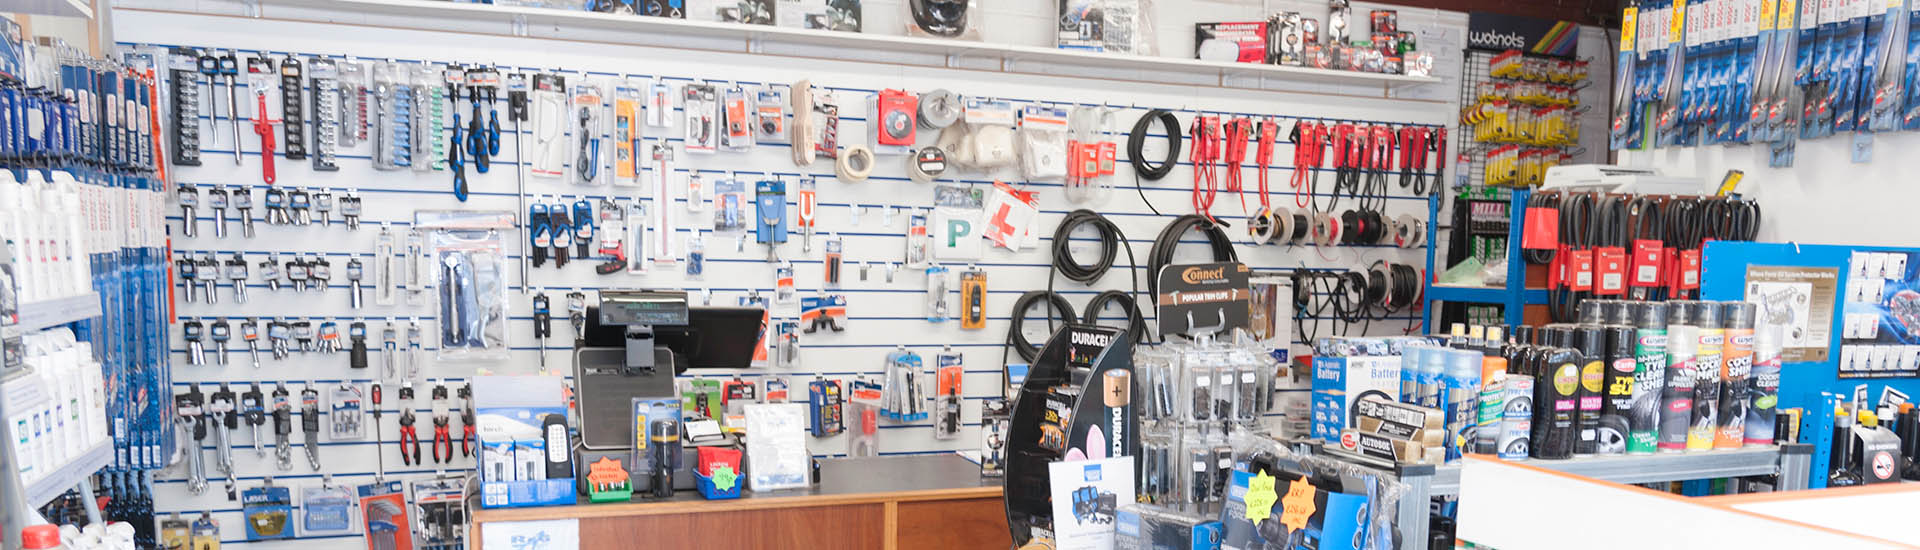 R & G Parts Shop